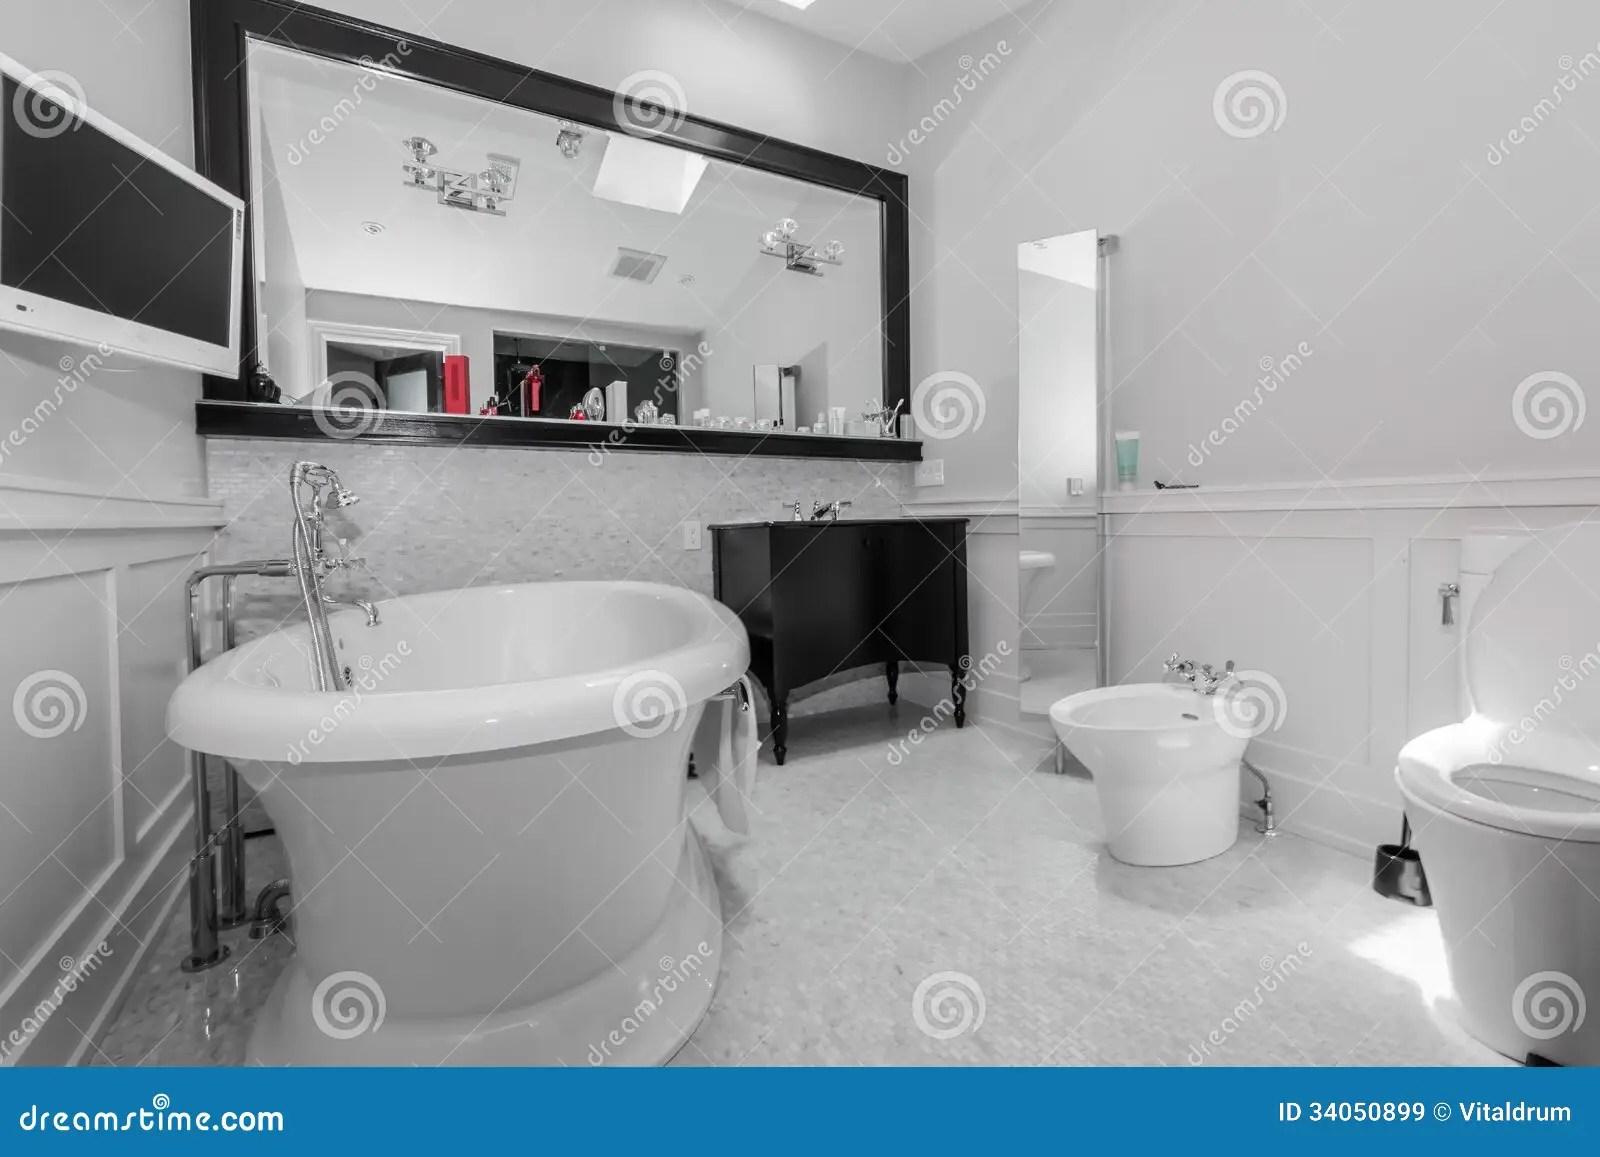 Free Bathroom Design App